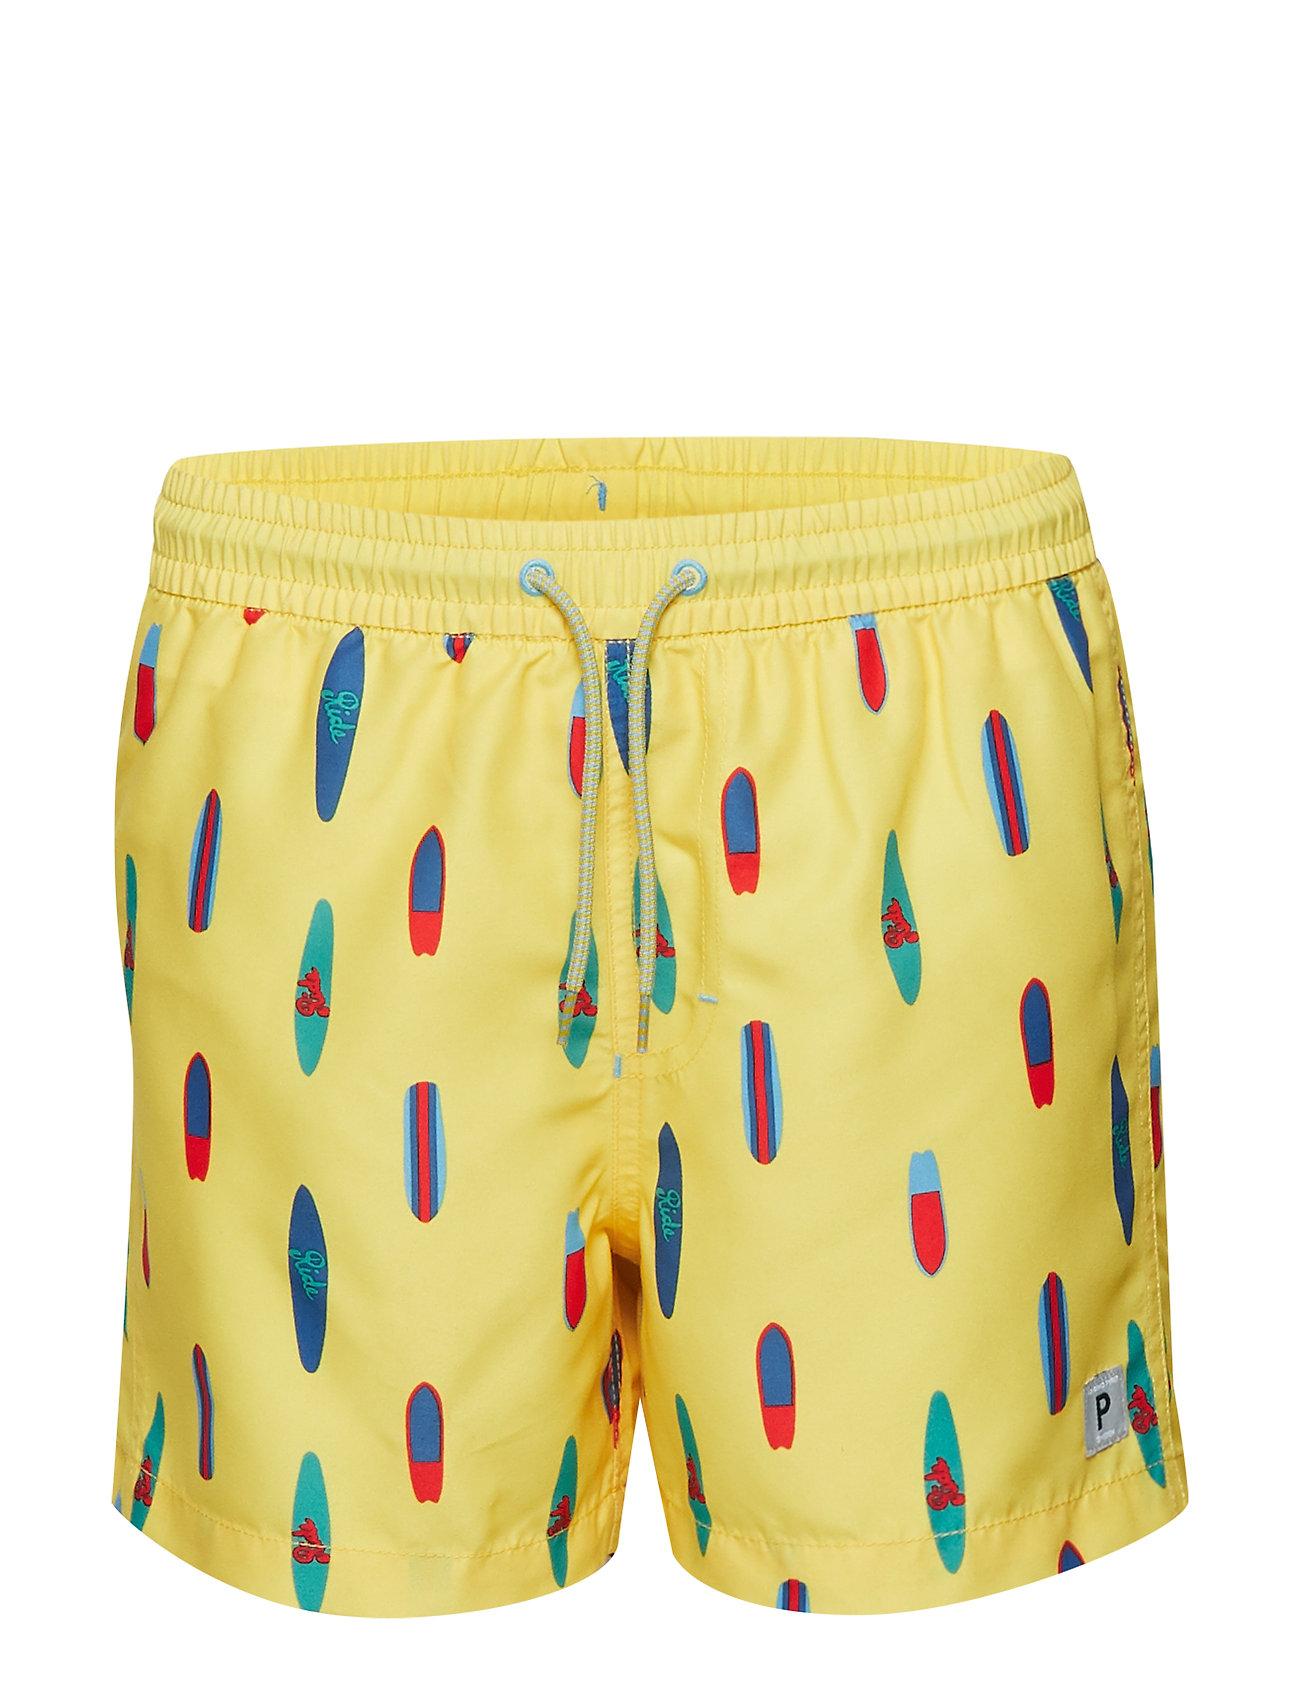 Polarn O. Pyret Swimwear Pants AOP School